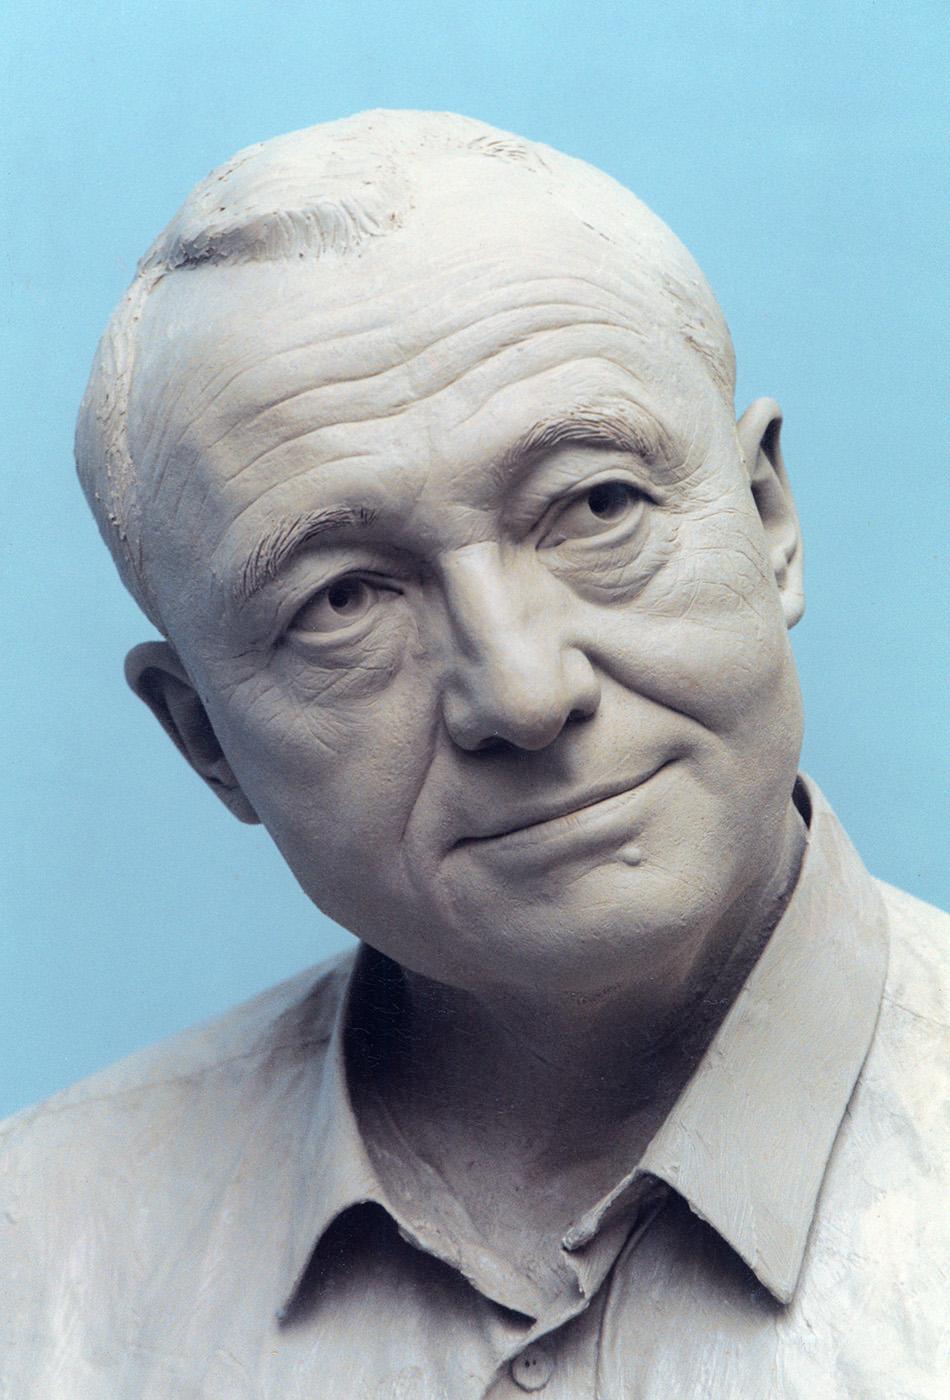 Portrait sculptor Ken Livingstone